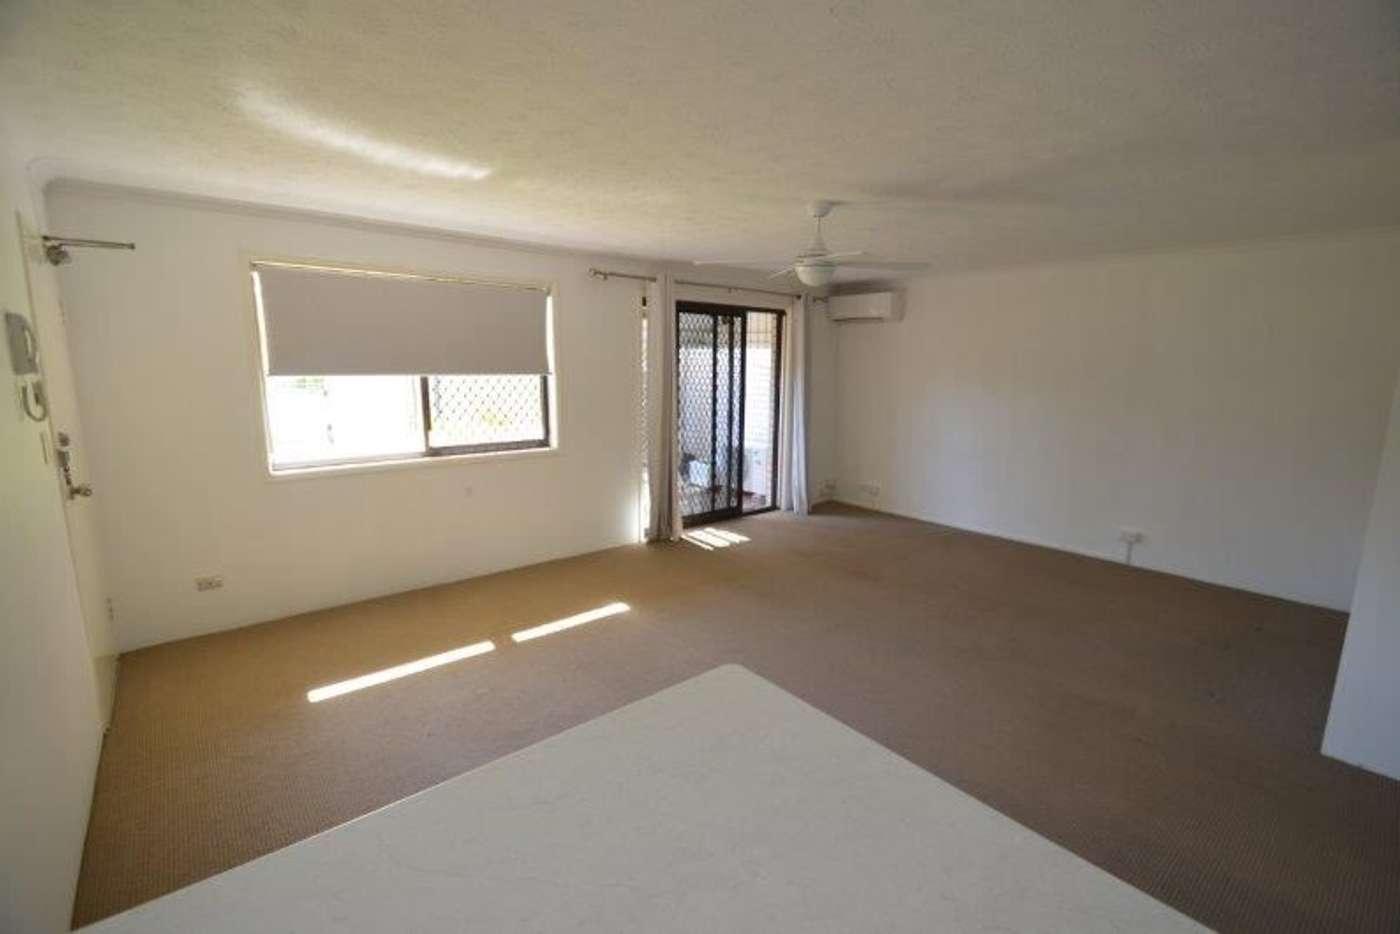 Sixth view of Homely unit listing, 1/14 Brett Avenue, Labrador QLD 4215